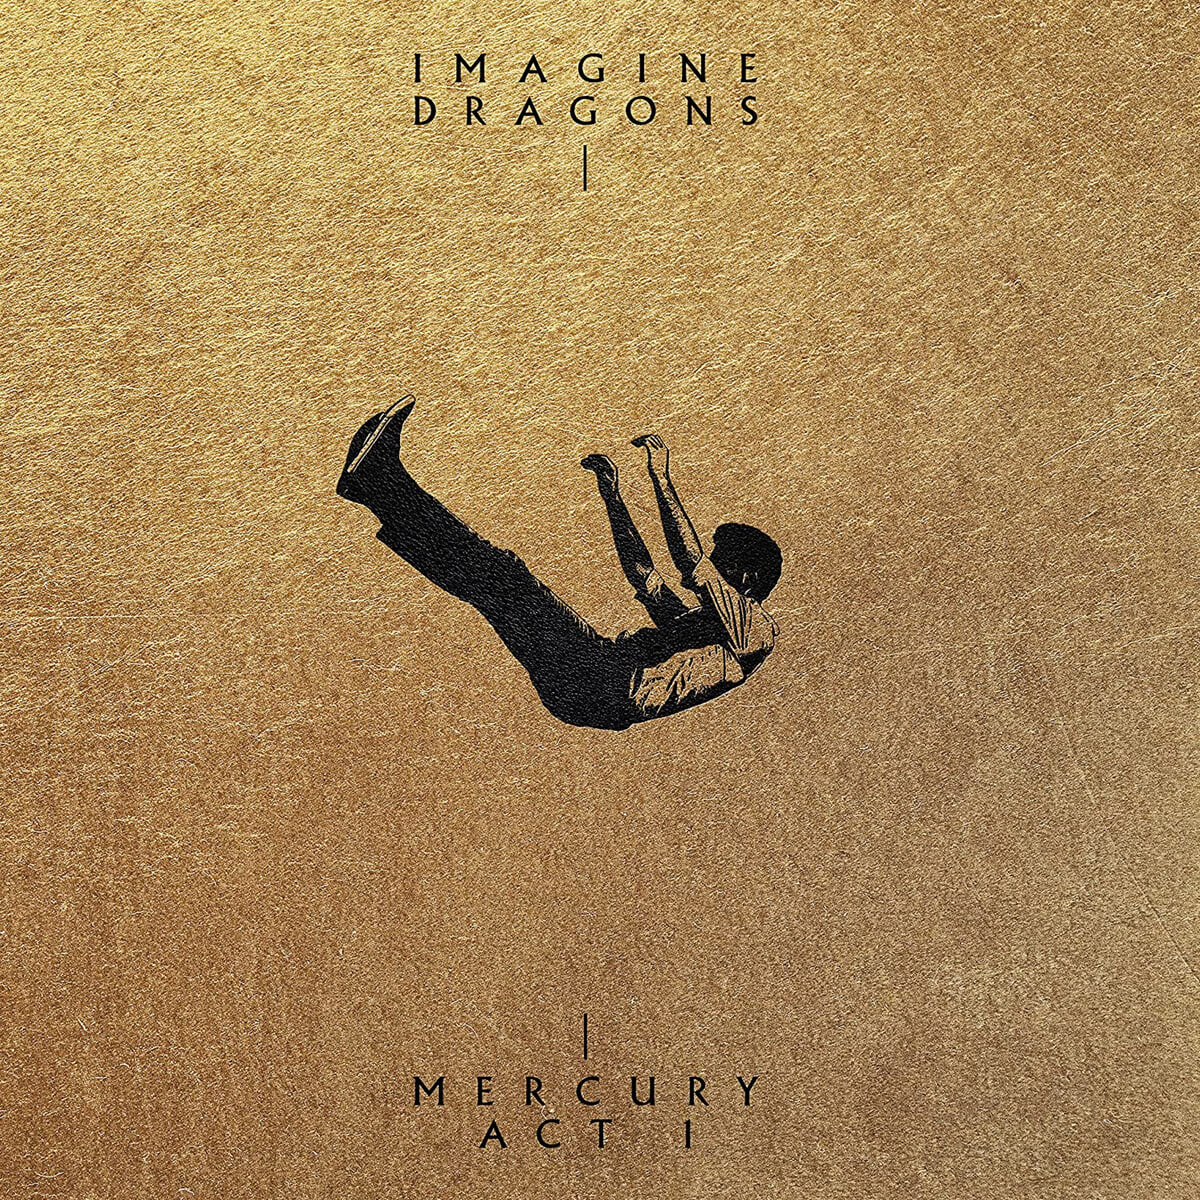 Imagine Dragons (이매진 드래곤스) - 5집 Mercury - Act 1